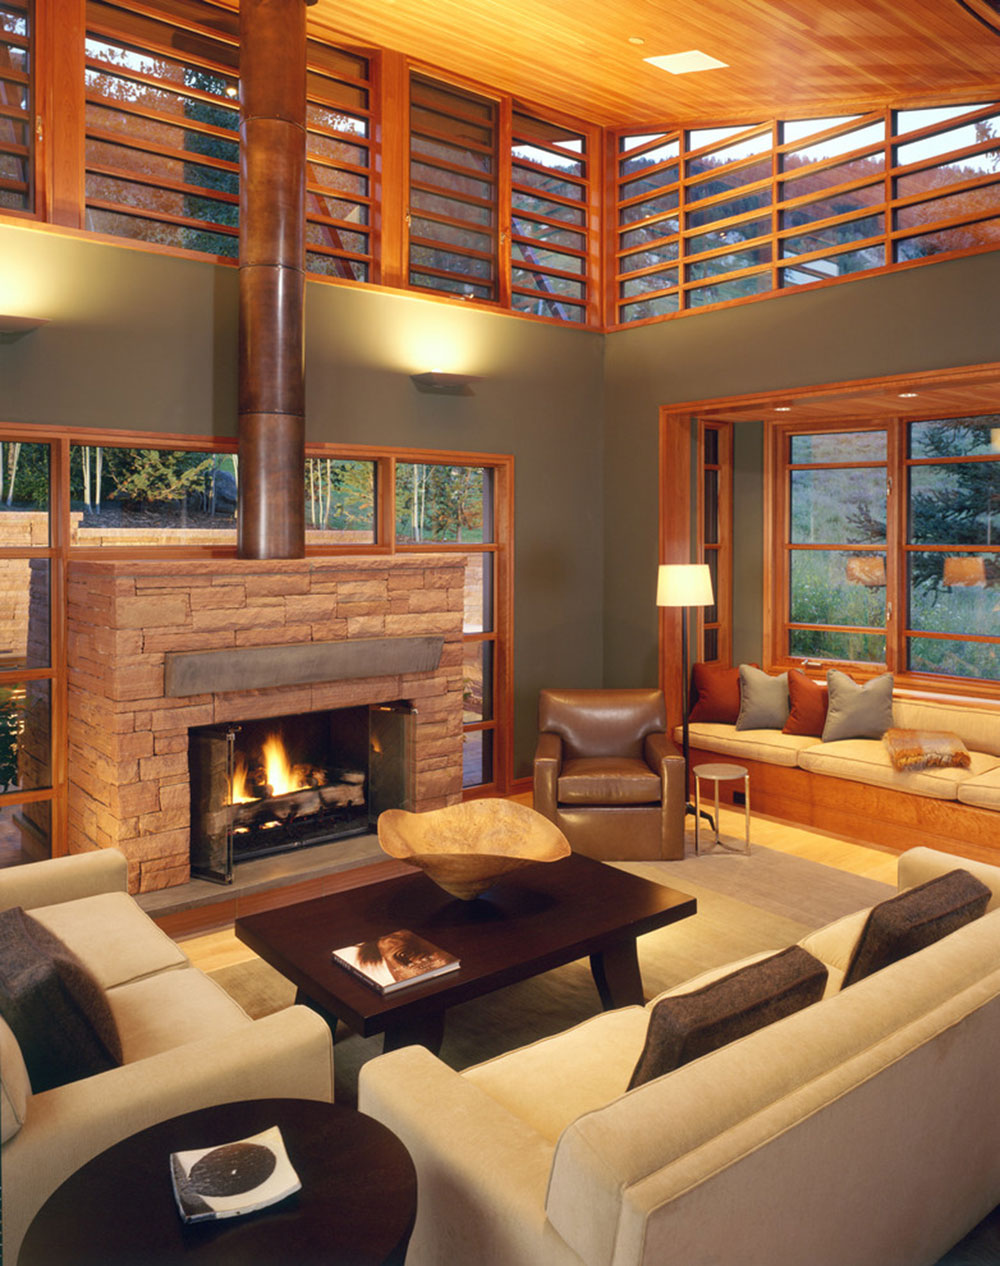 Amaizing-Living-Room-Paint-Colors12 Fantastiska Living Room Paint Colors